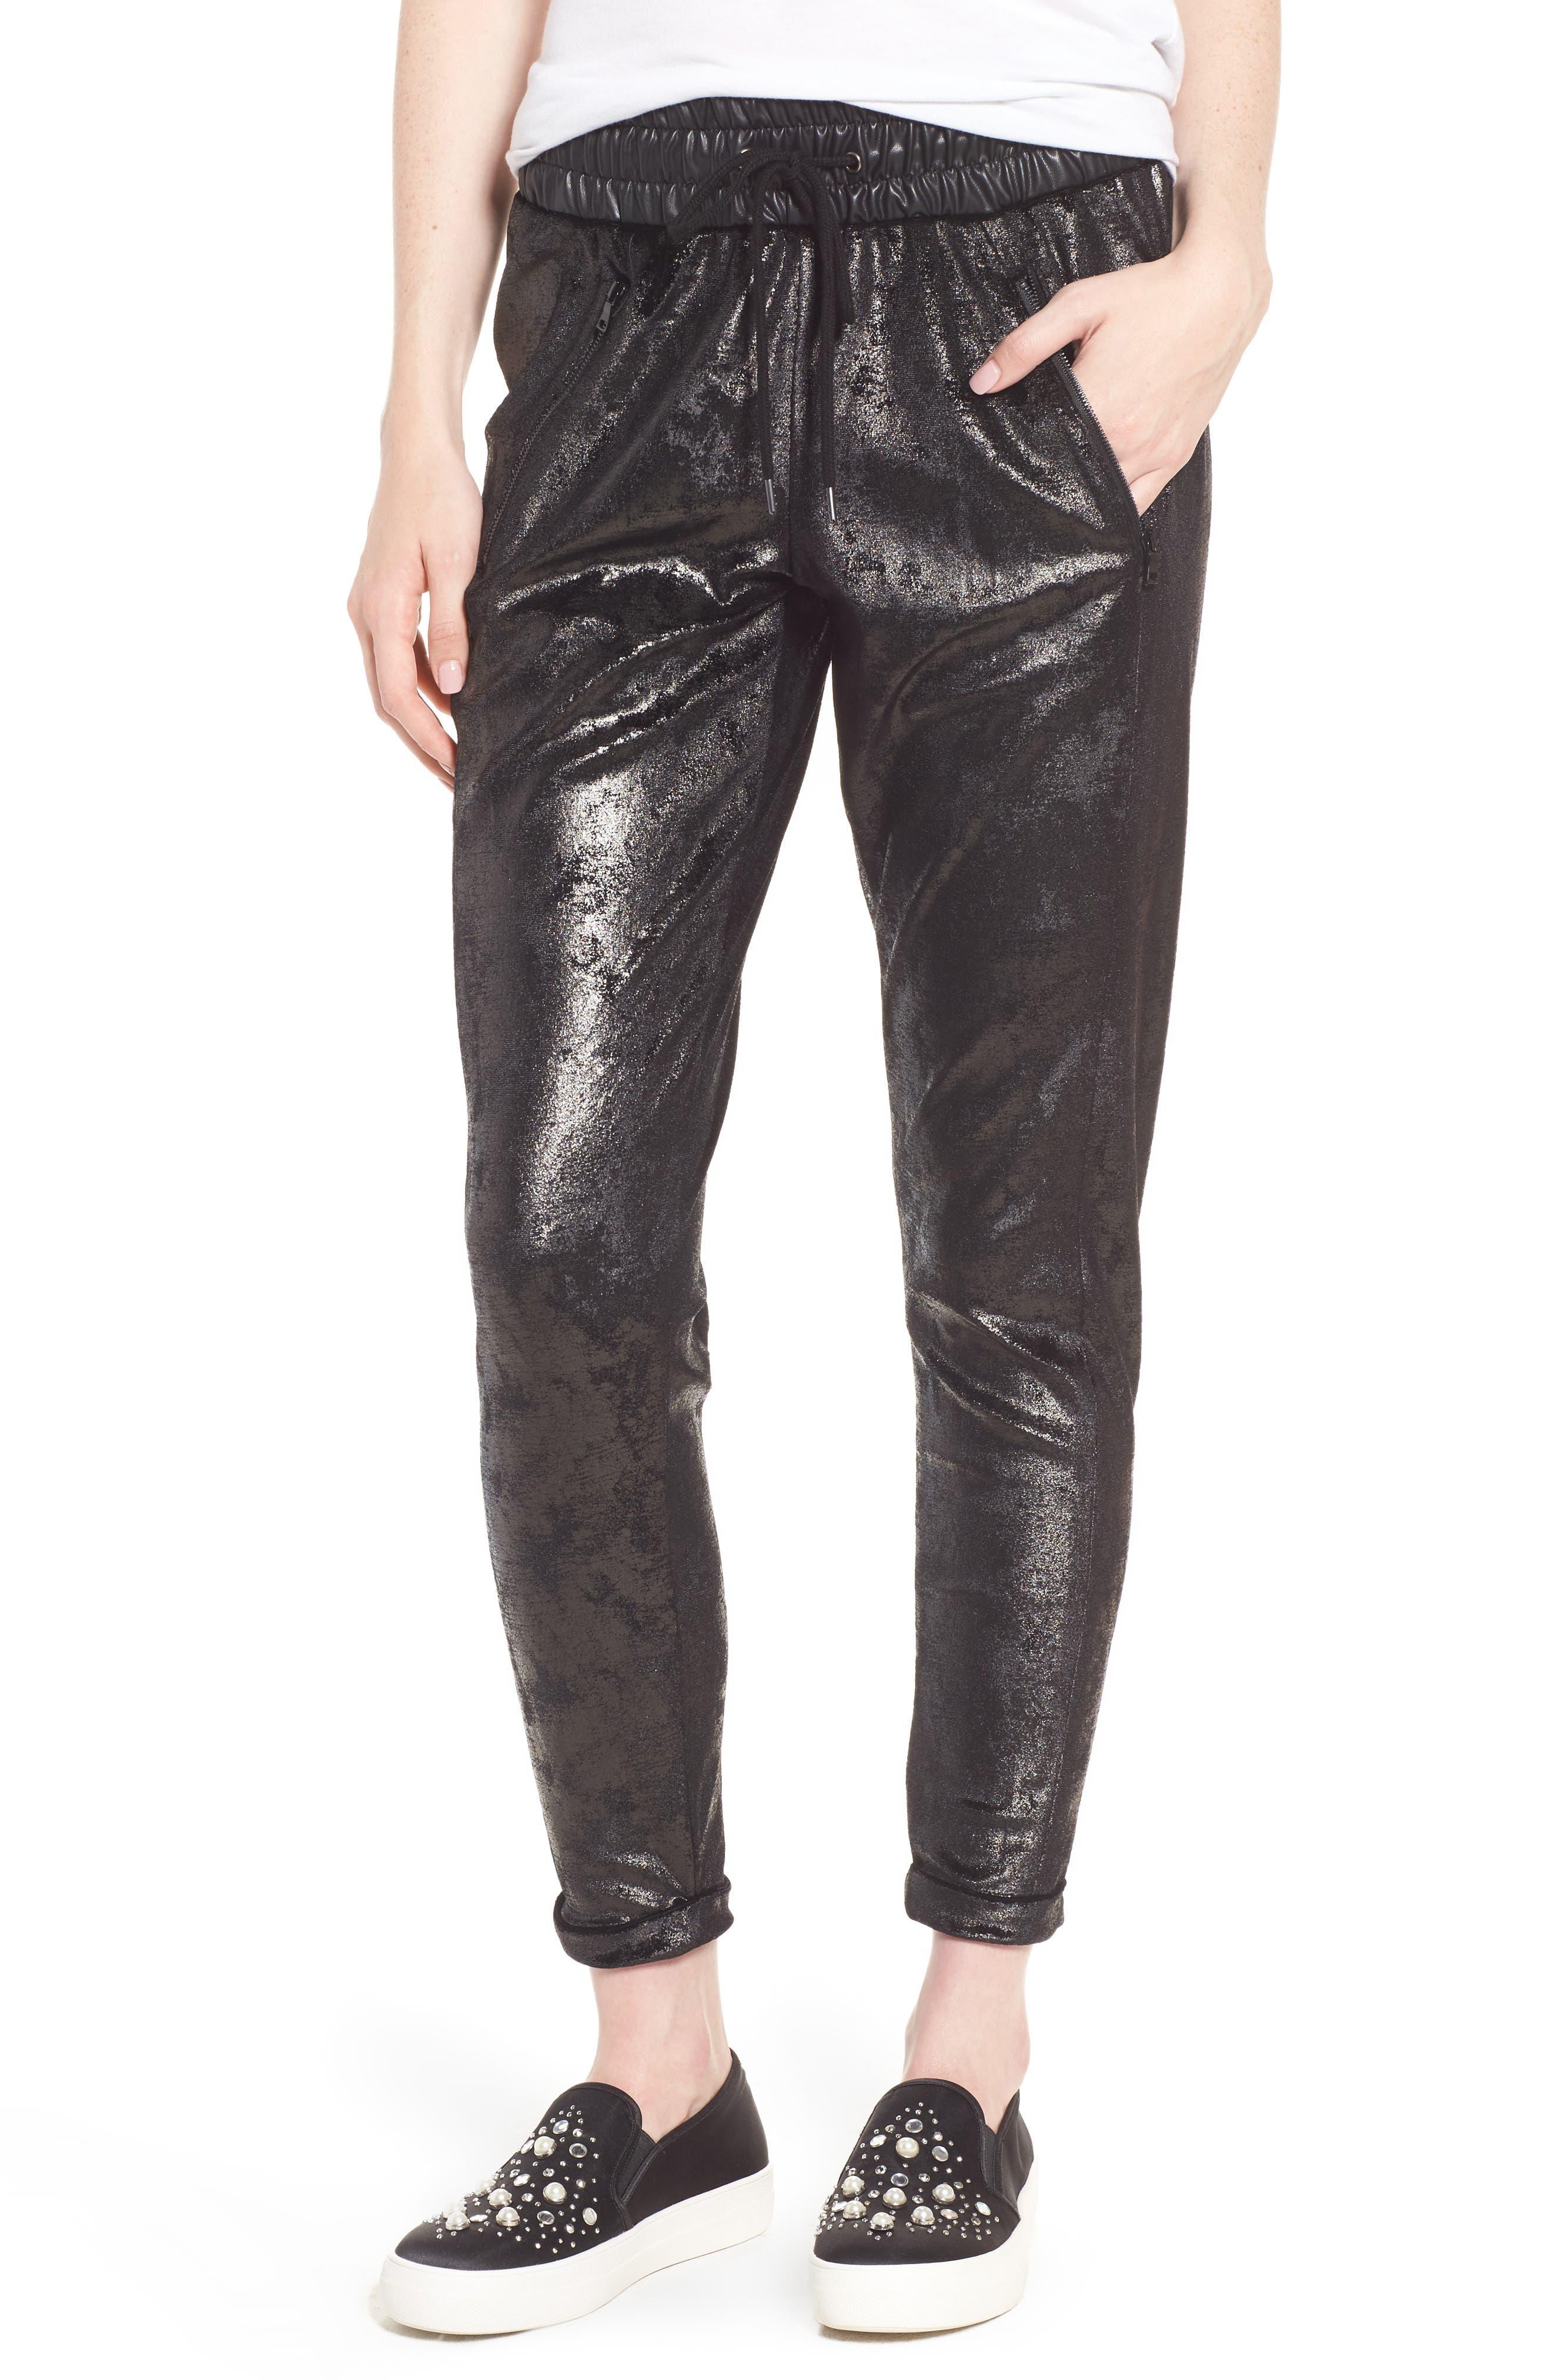 Randall Cuffed Sweatpants,                         Main,                         color, 001